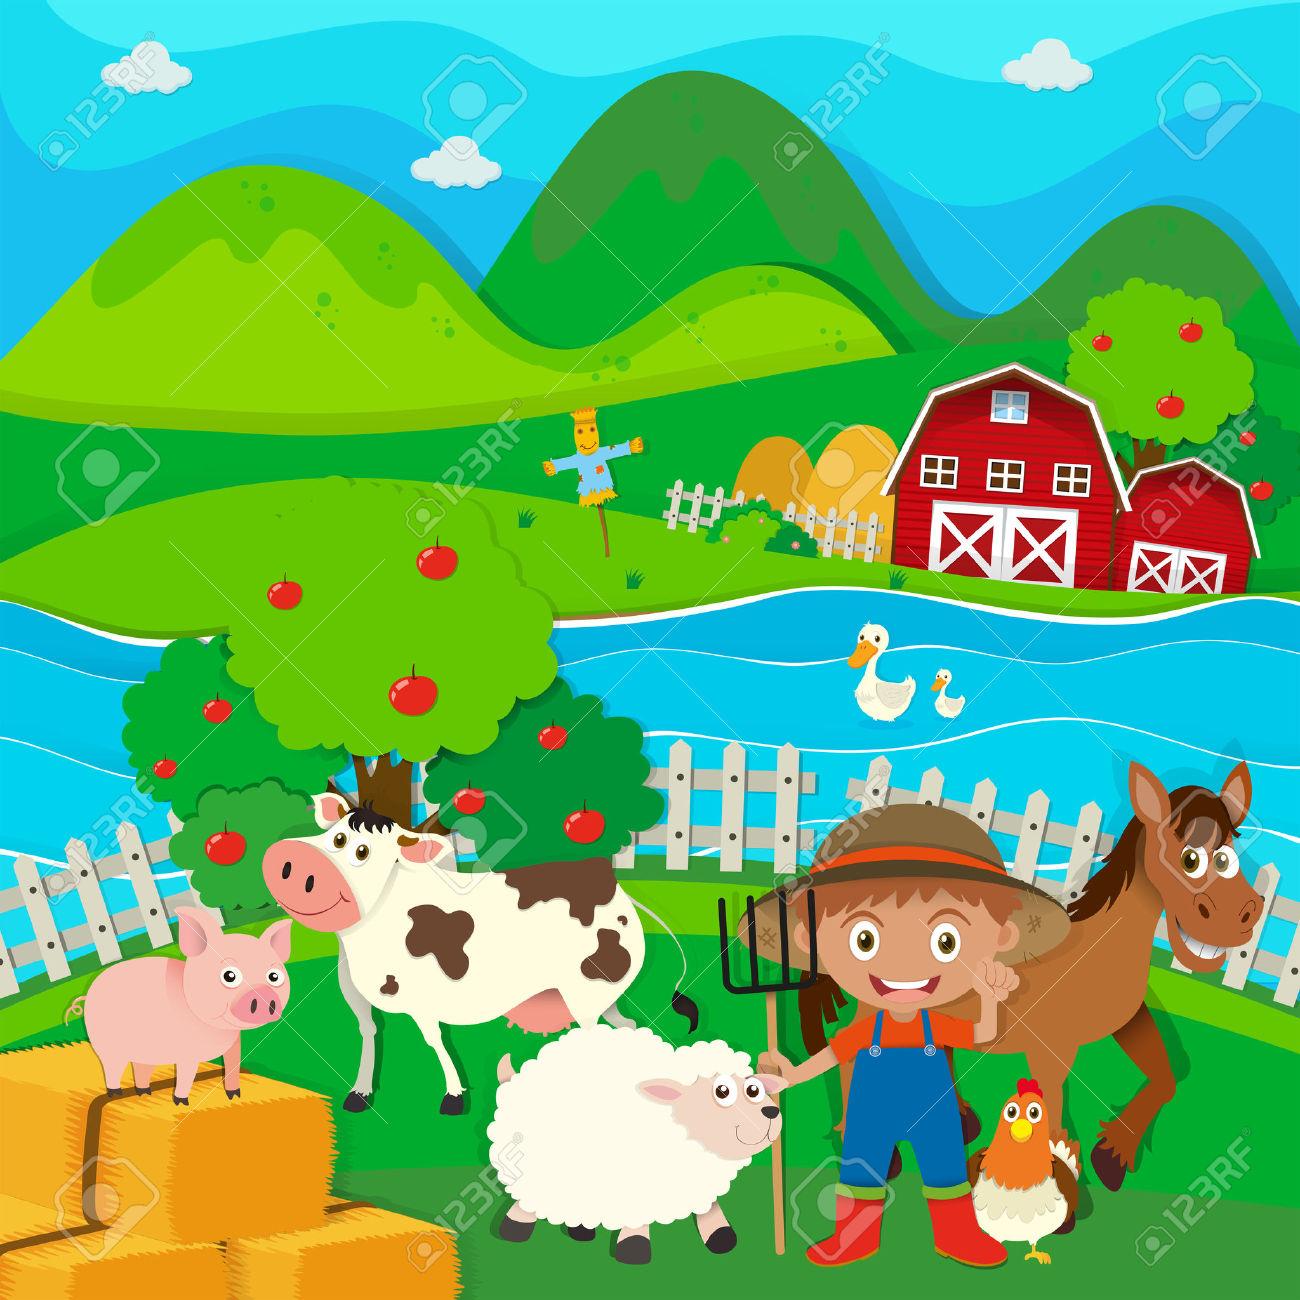 Farmer And Farm Animals On The Farm Illustration Royalty Free.